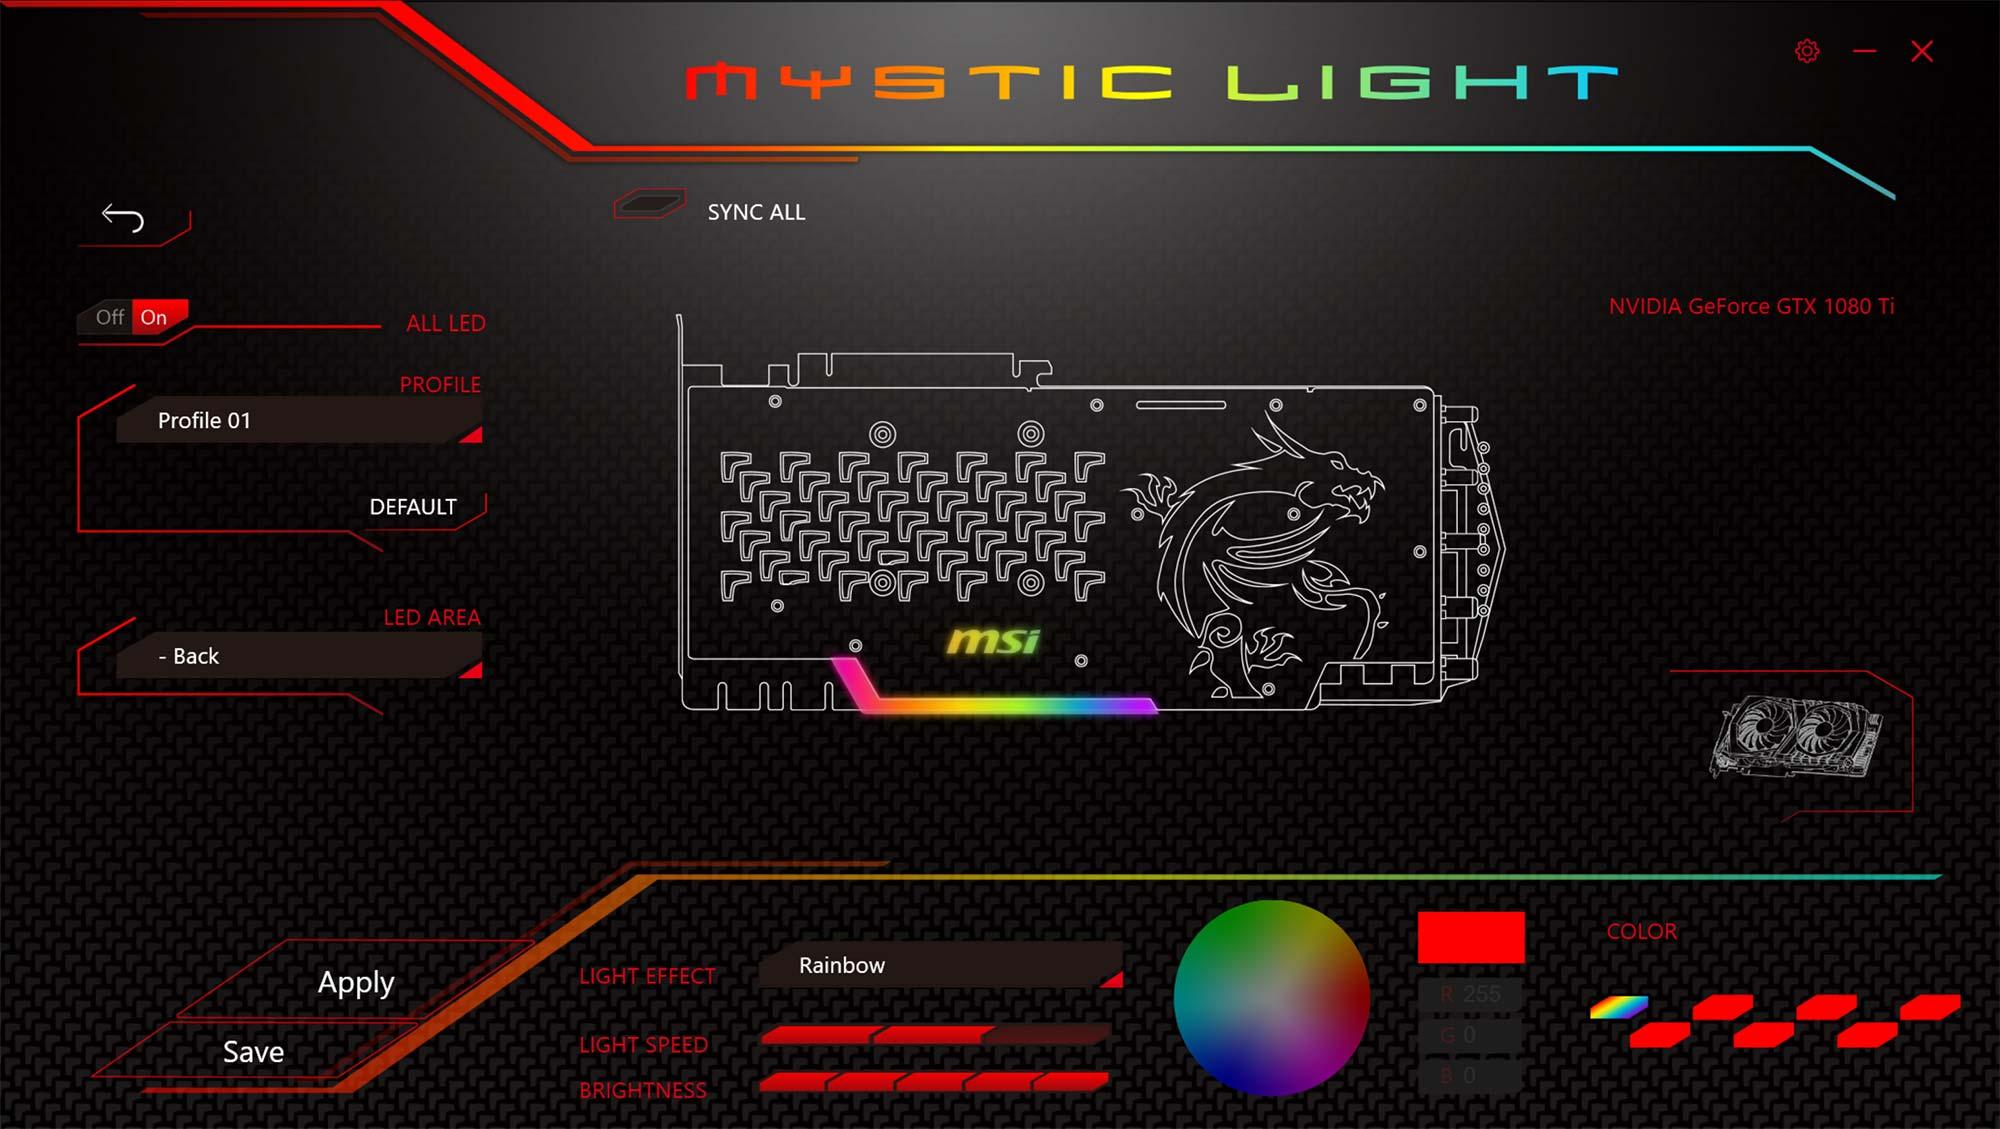 Geforce Gtx 1080 Ti Gaming X Trio Graphics Card The World Leader Lighting Diagram Program Airflow